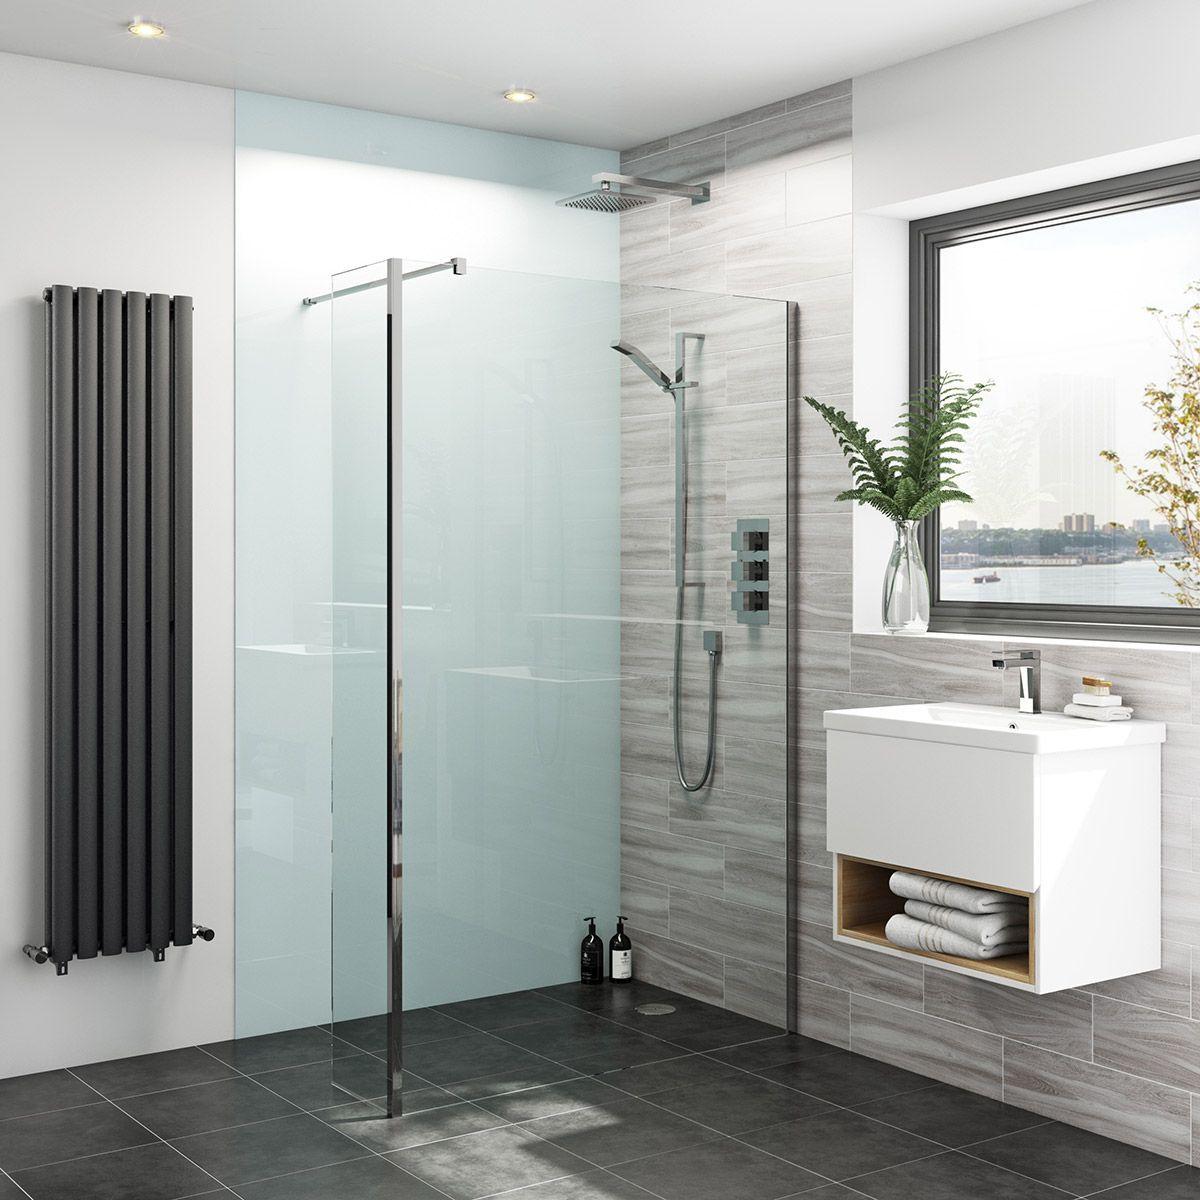 Zenolite Plus Air Acrylic Shower Wall Panel 2440 X 1220 Bathroom Shower Panels Acrylic Shower Walls Shower Wall Panels